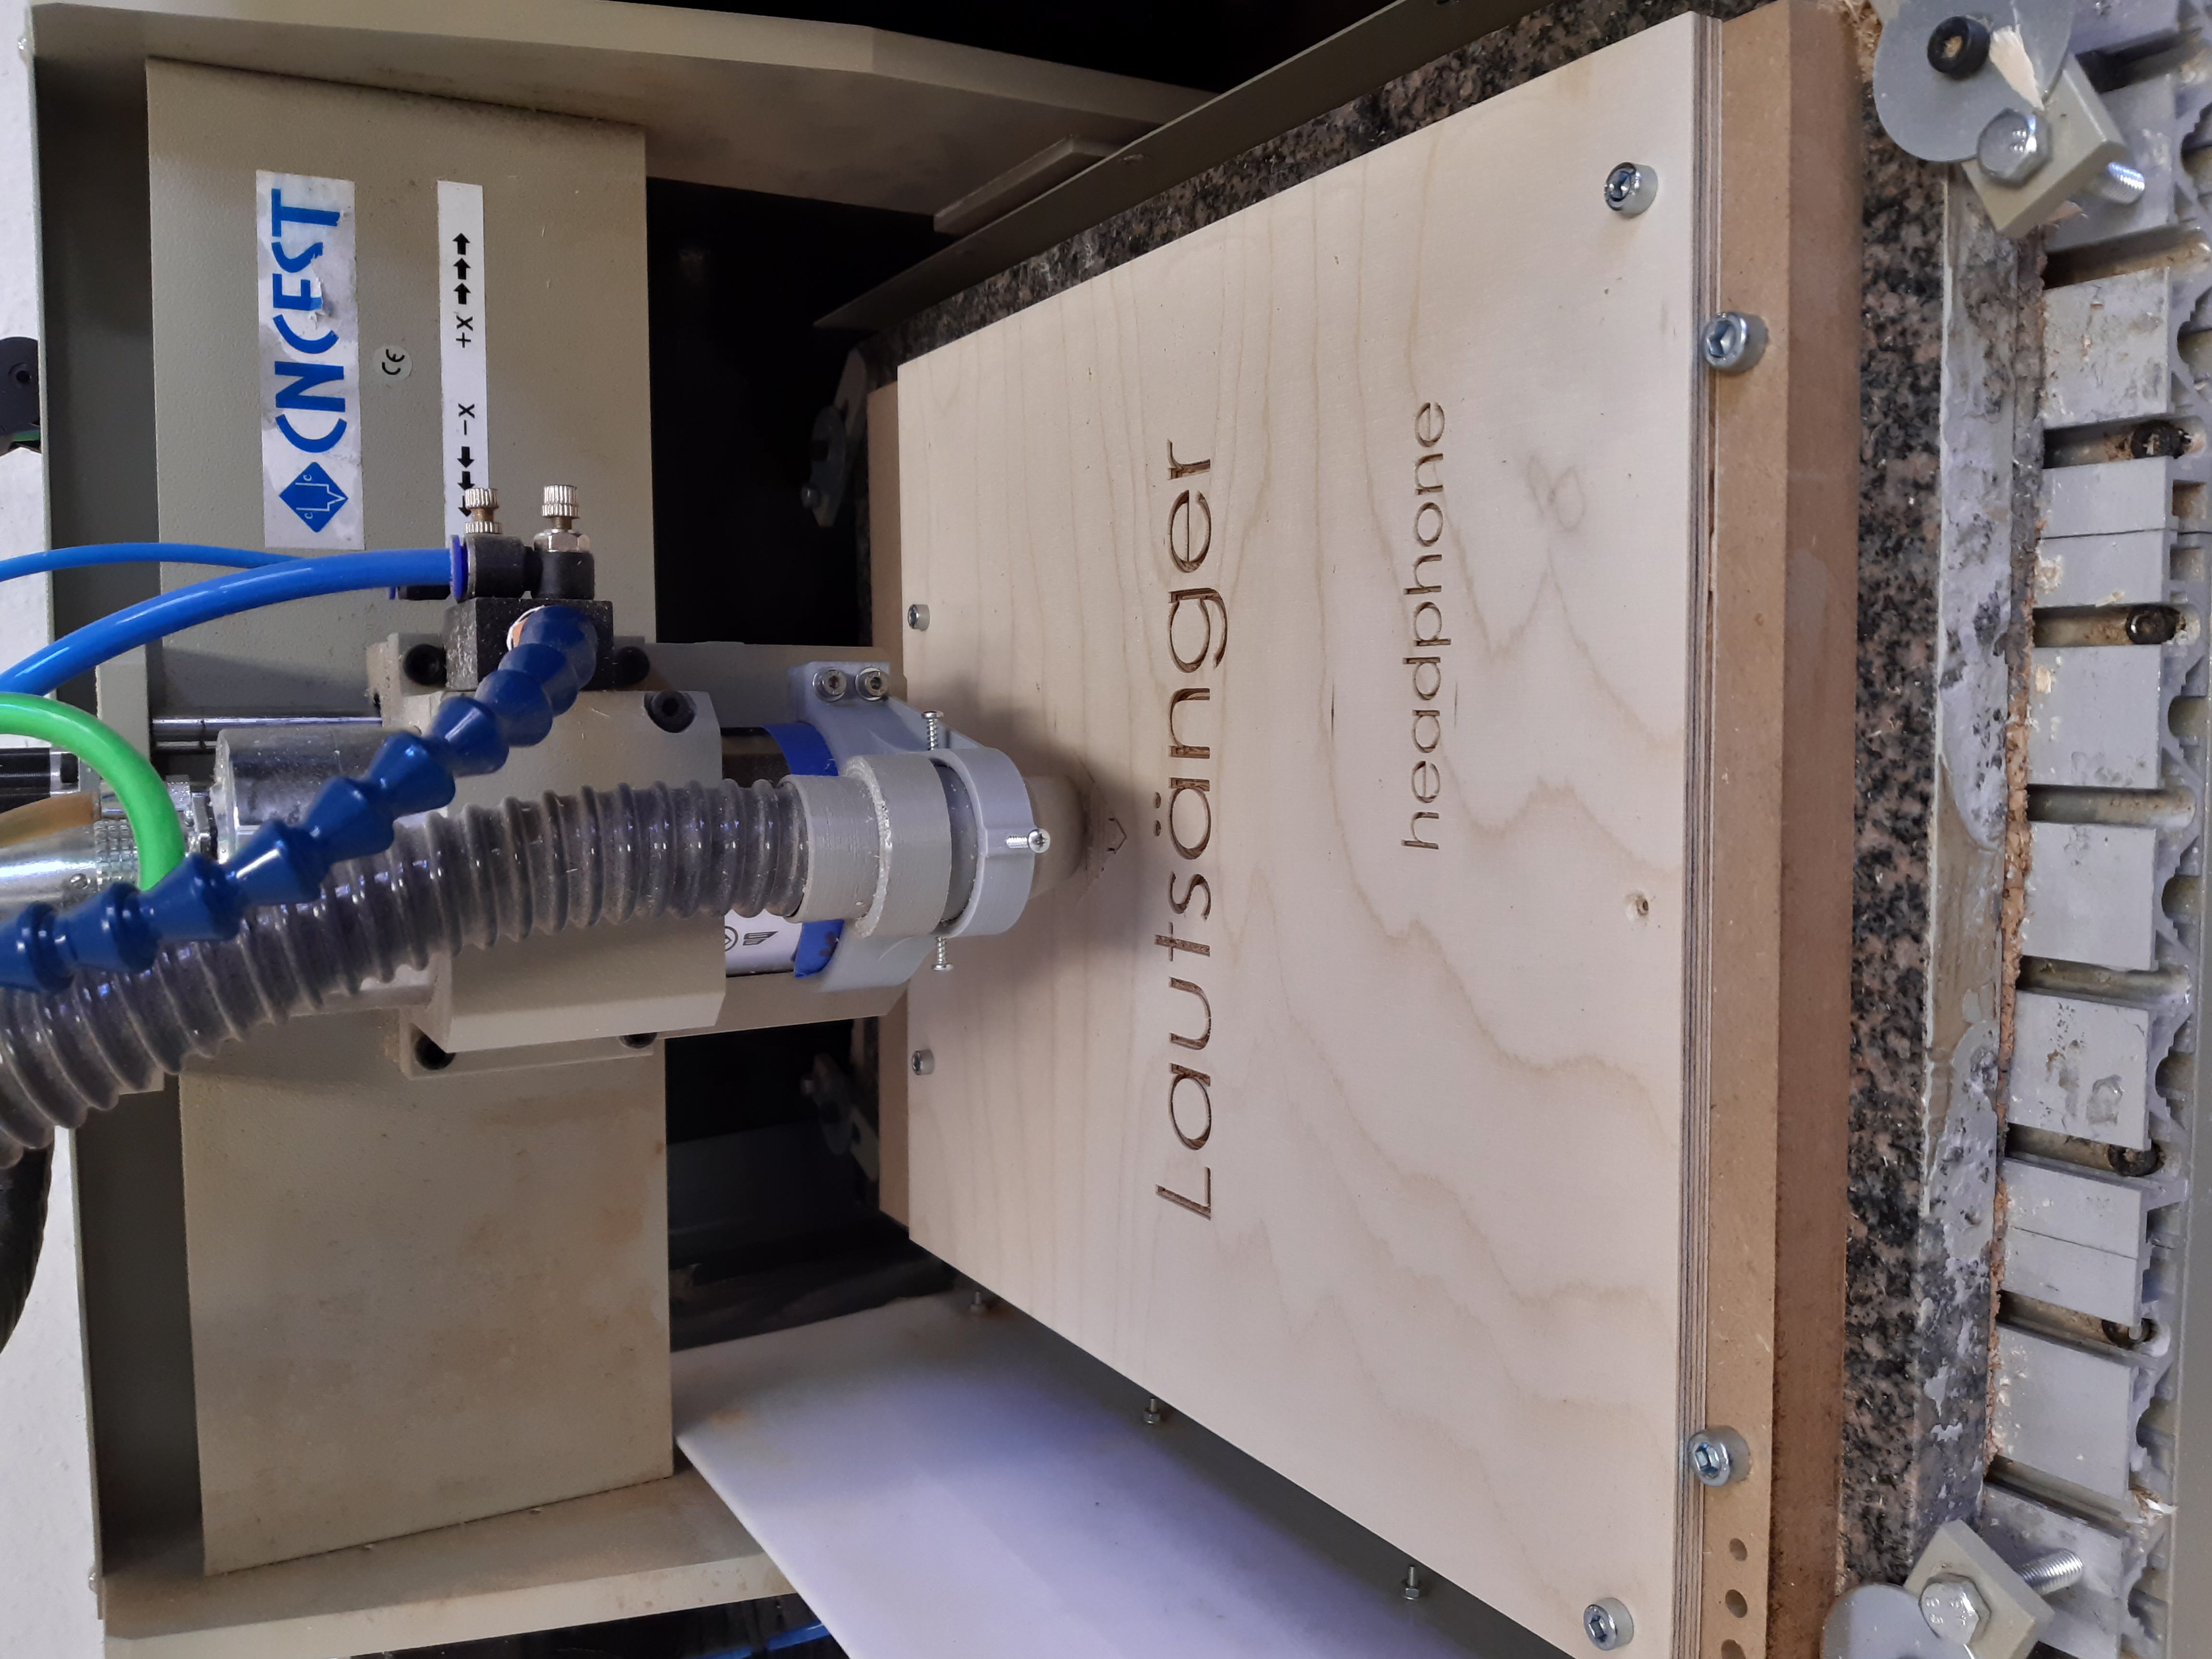 Lautsänger Holzbox Produktion